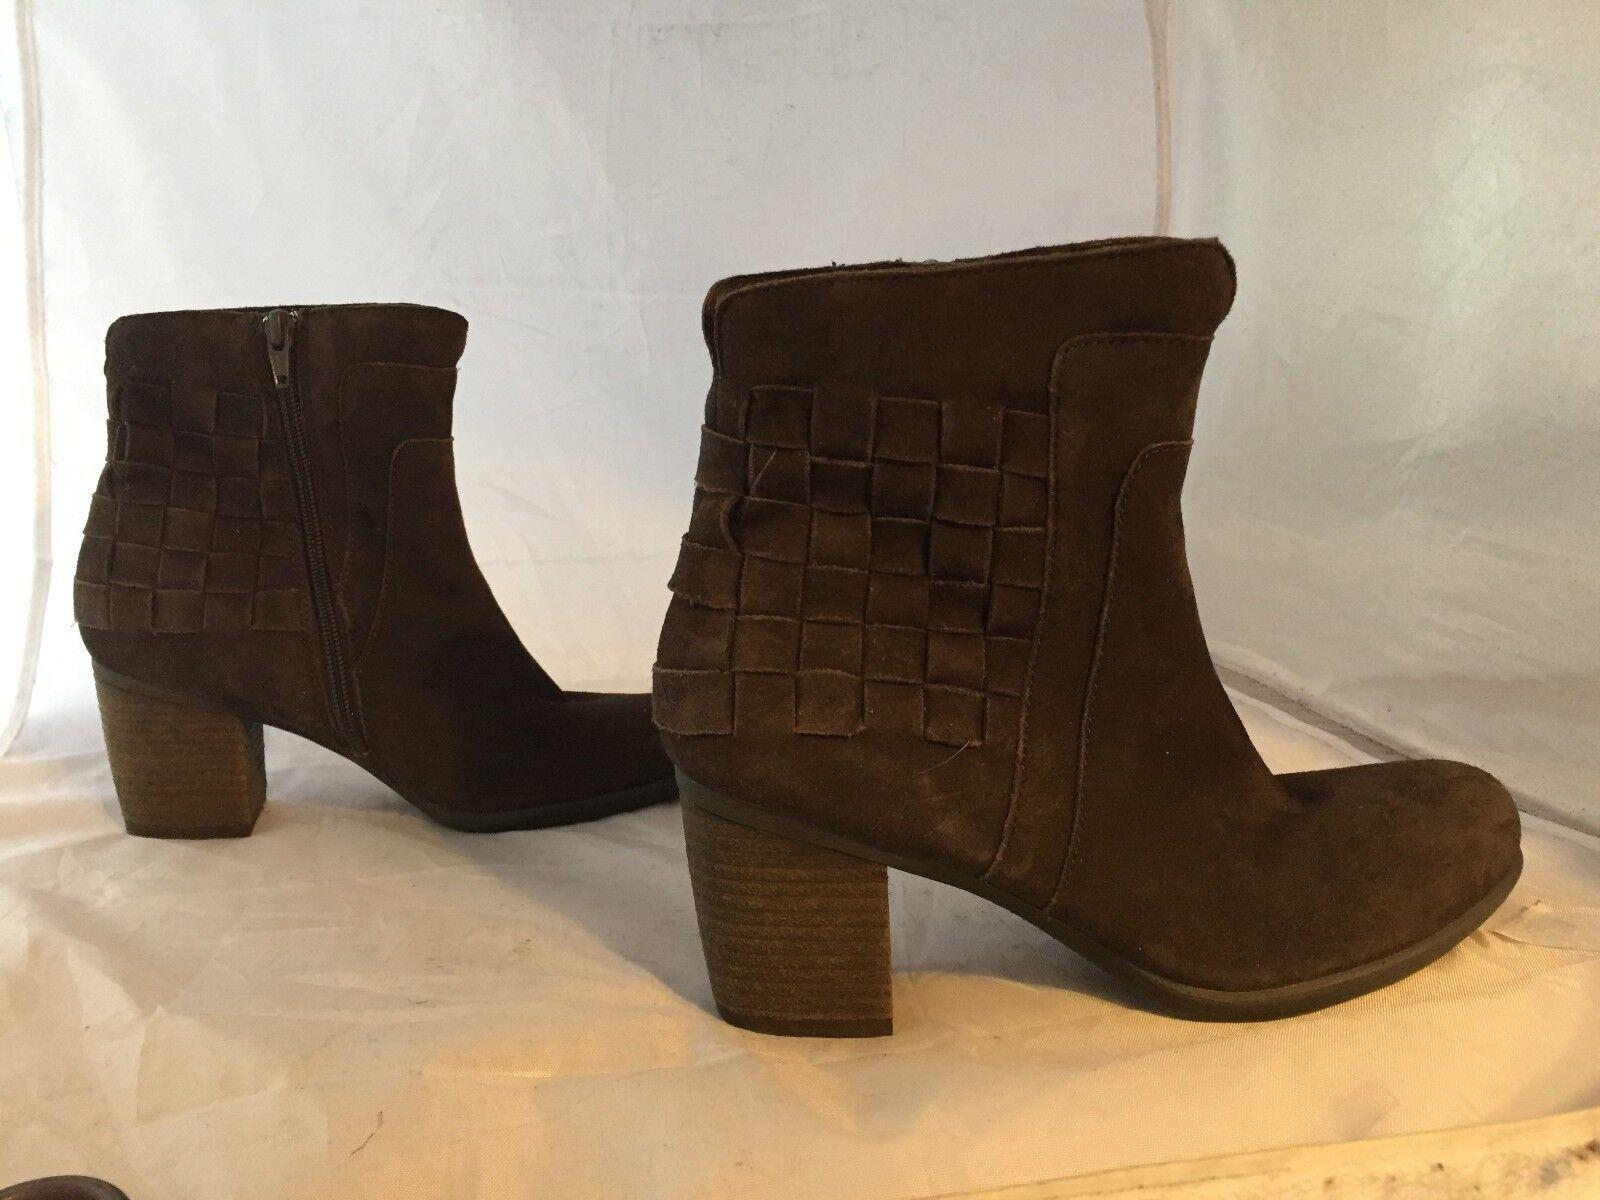 NEW JOSEF SEIBEL marron Suede Ankle démarrage, Woven, femmes Taille 36 (5.5 US)  160